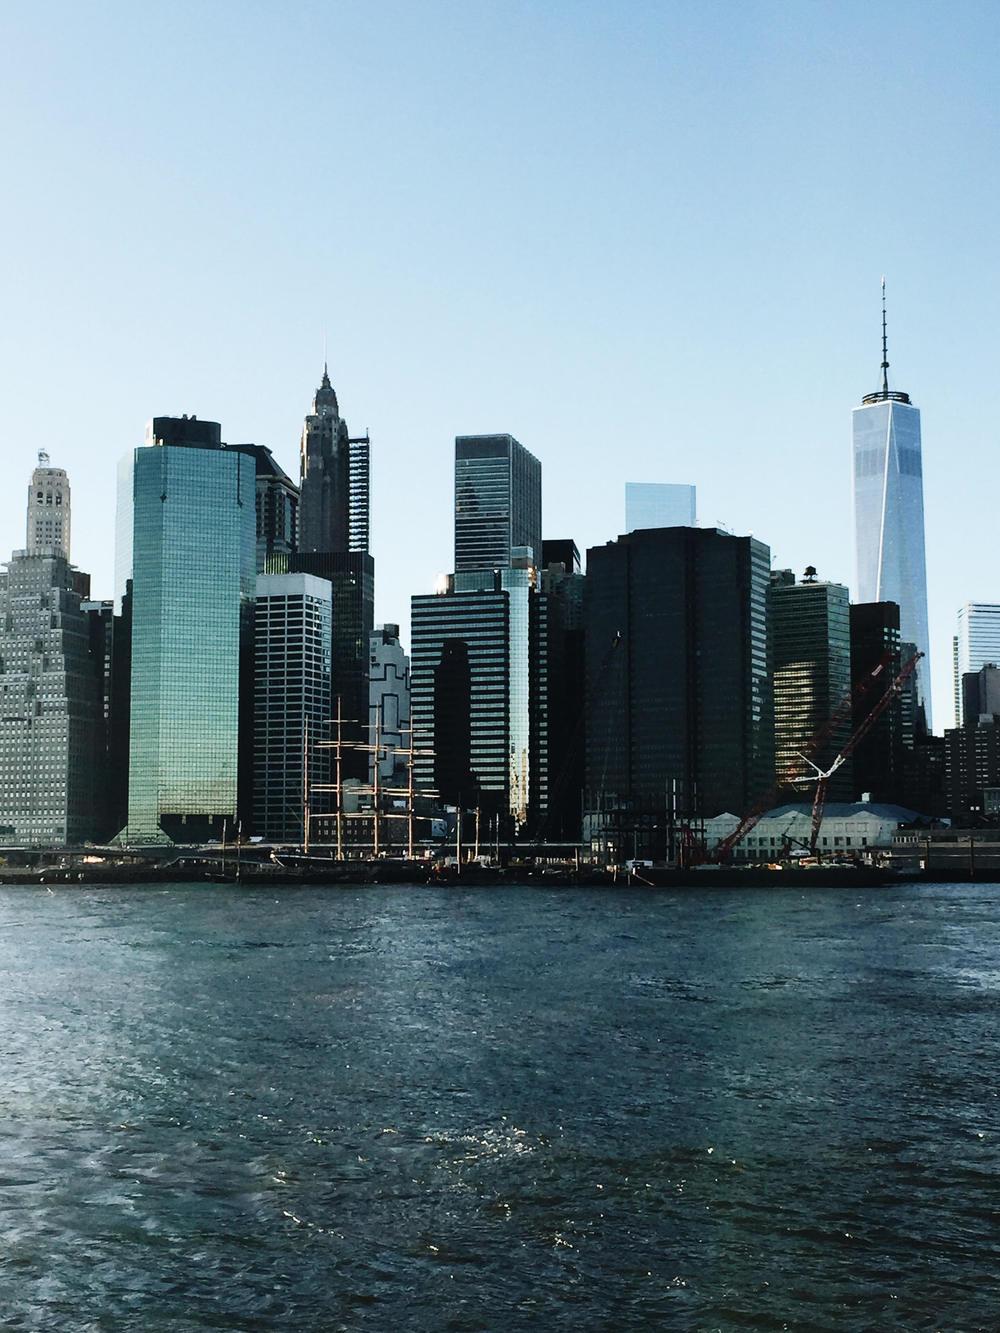 arushi khosla, arushi.co, dumbo, brooklyn, new york city skyline